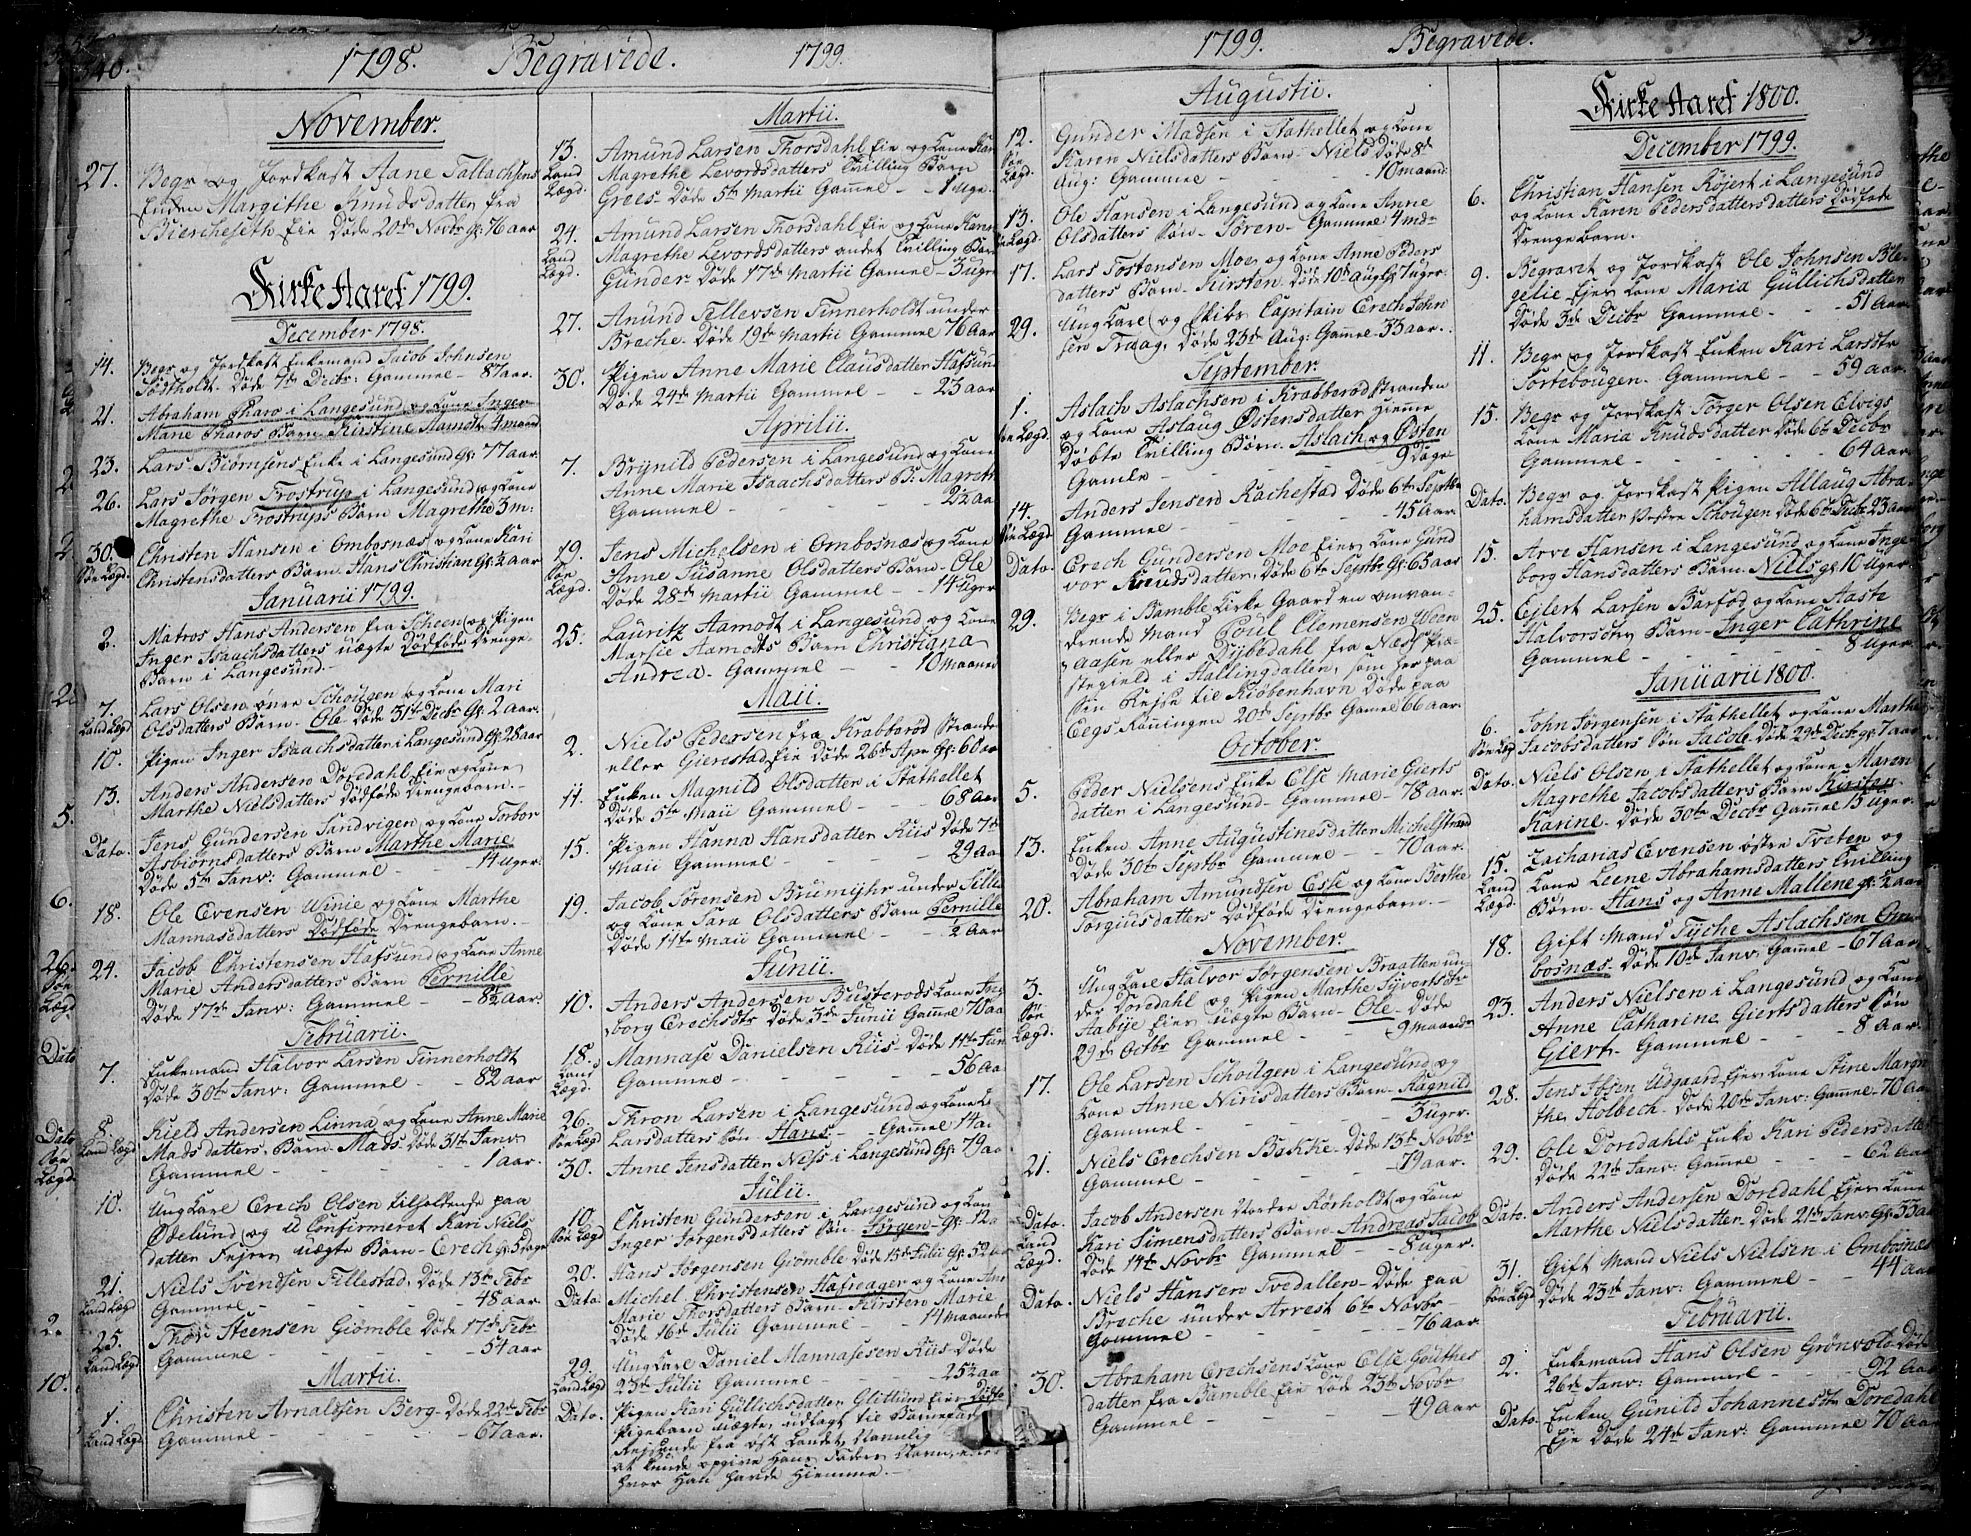 SAKO, Bamble kirkebøker, F/Fa/L0002: Ministerialbok nr. I 2, 1775-1814, s. 540-541